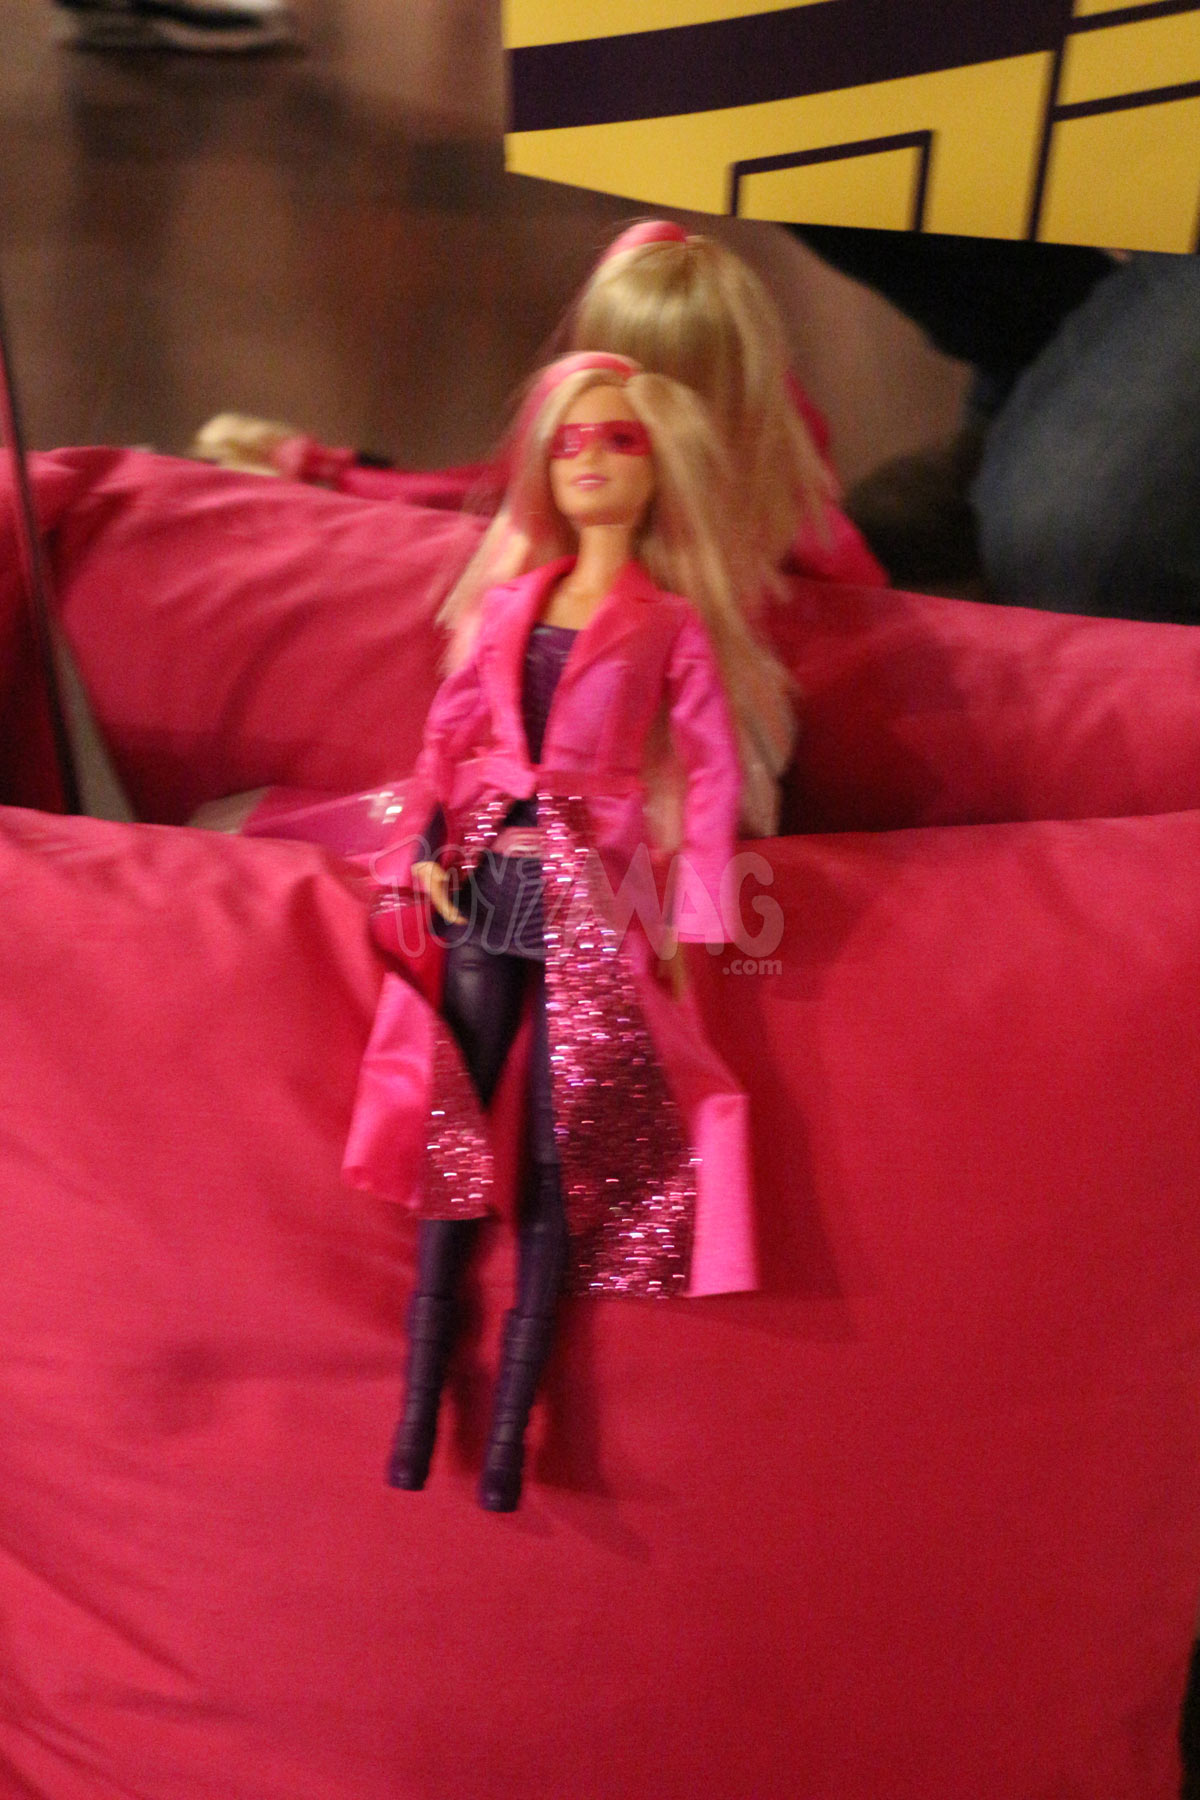 barbie agent secret le girl power passe l action. Black Bedroom Furniture Sets. Home Design Ideas